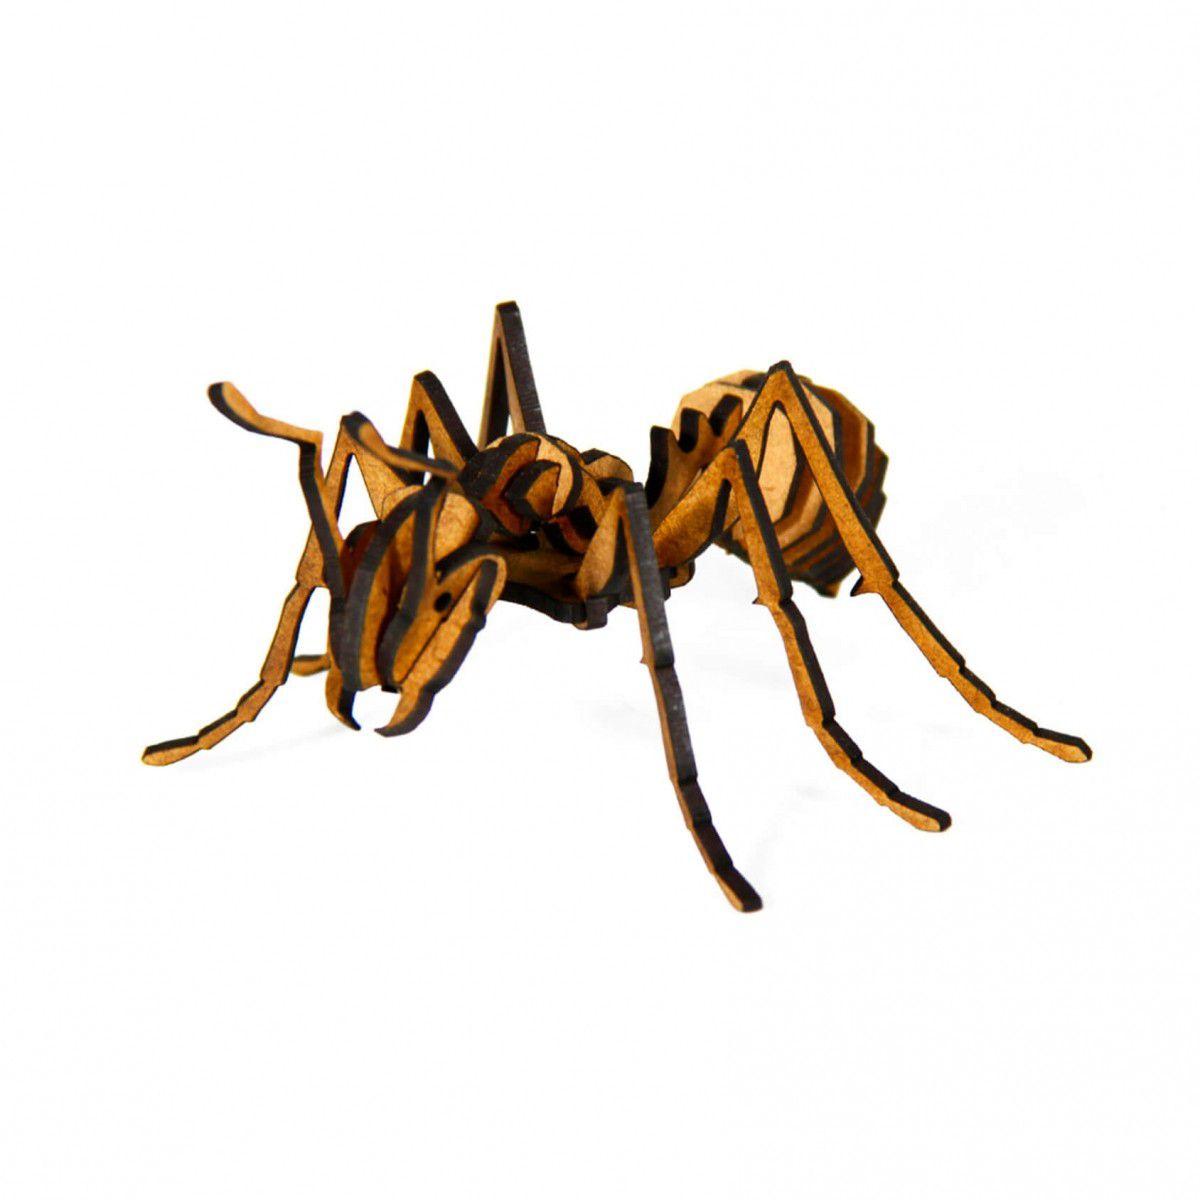 Insetos - Miniatura para montar Formiga